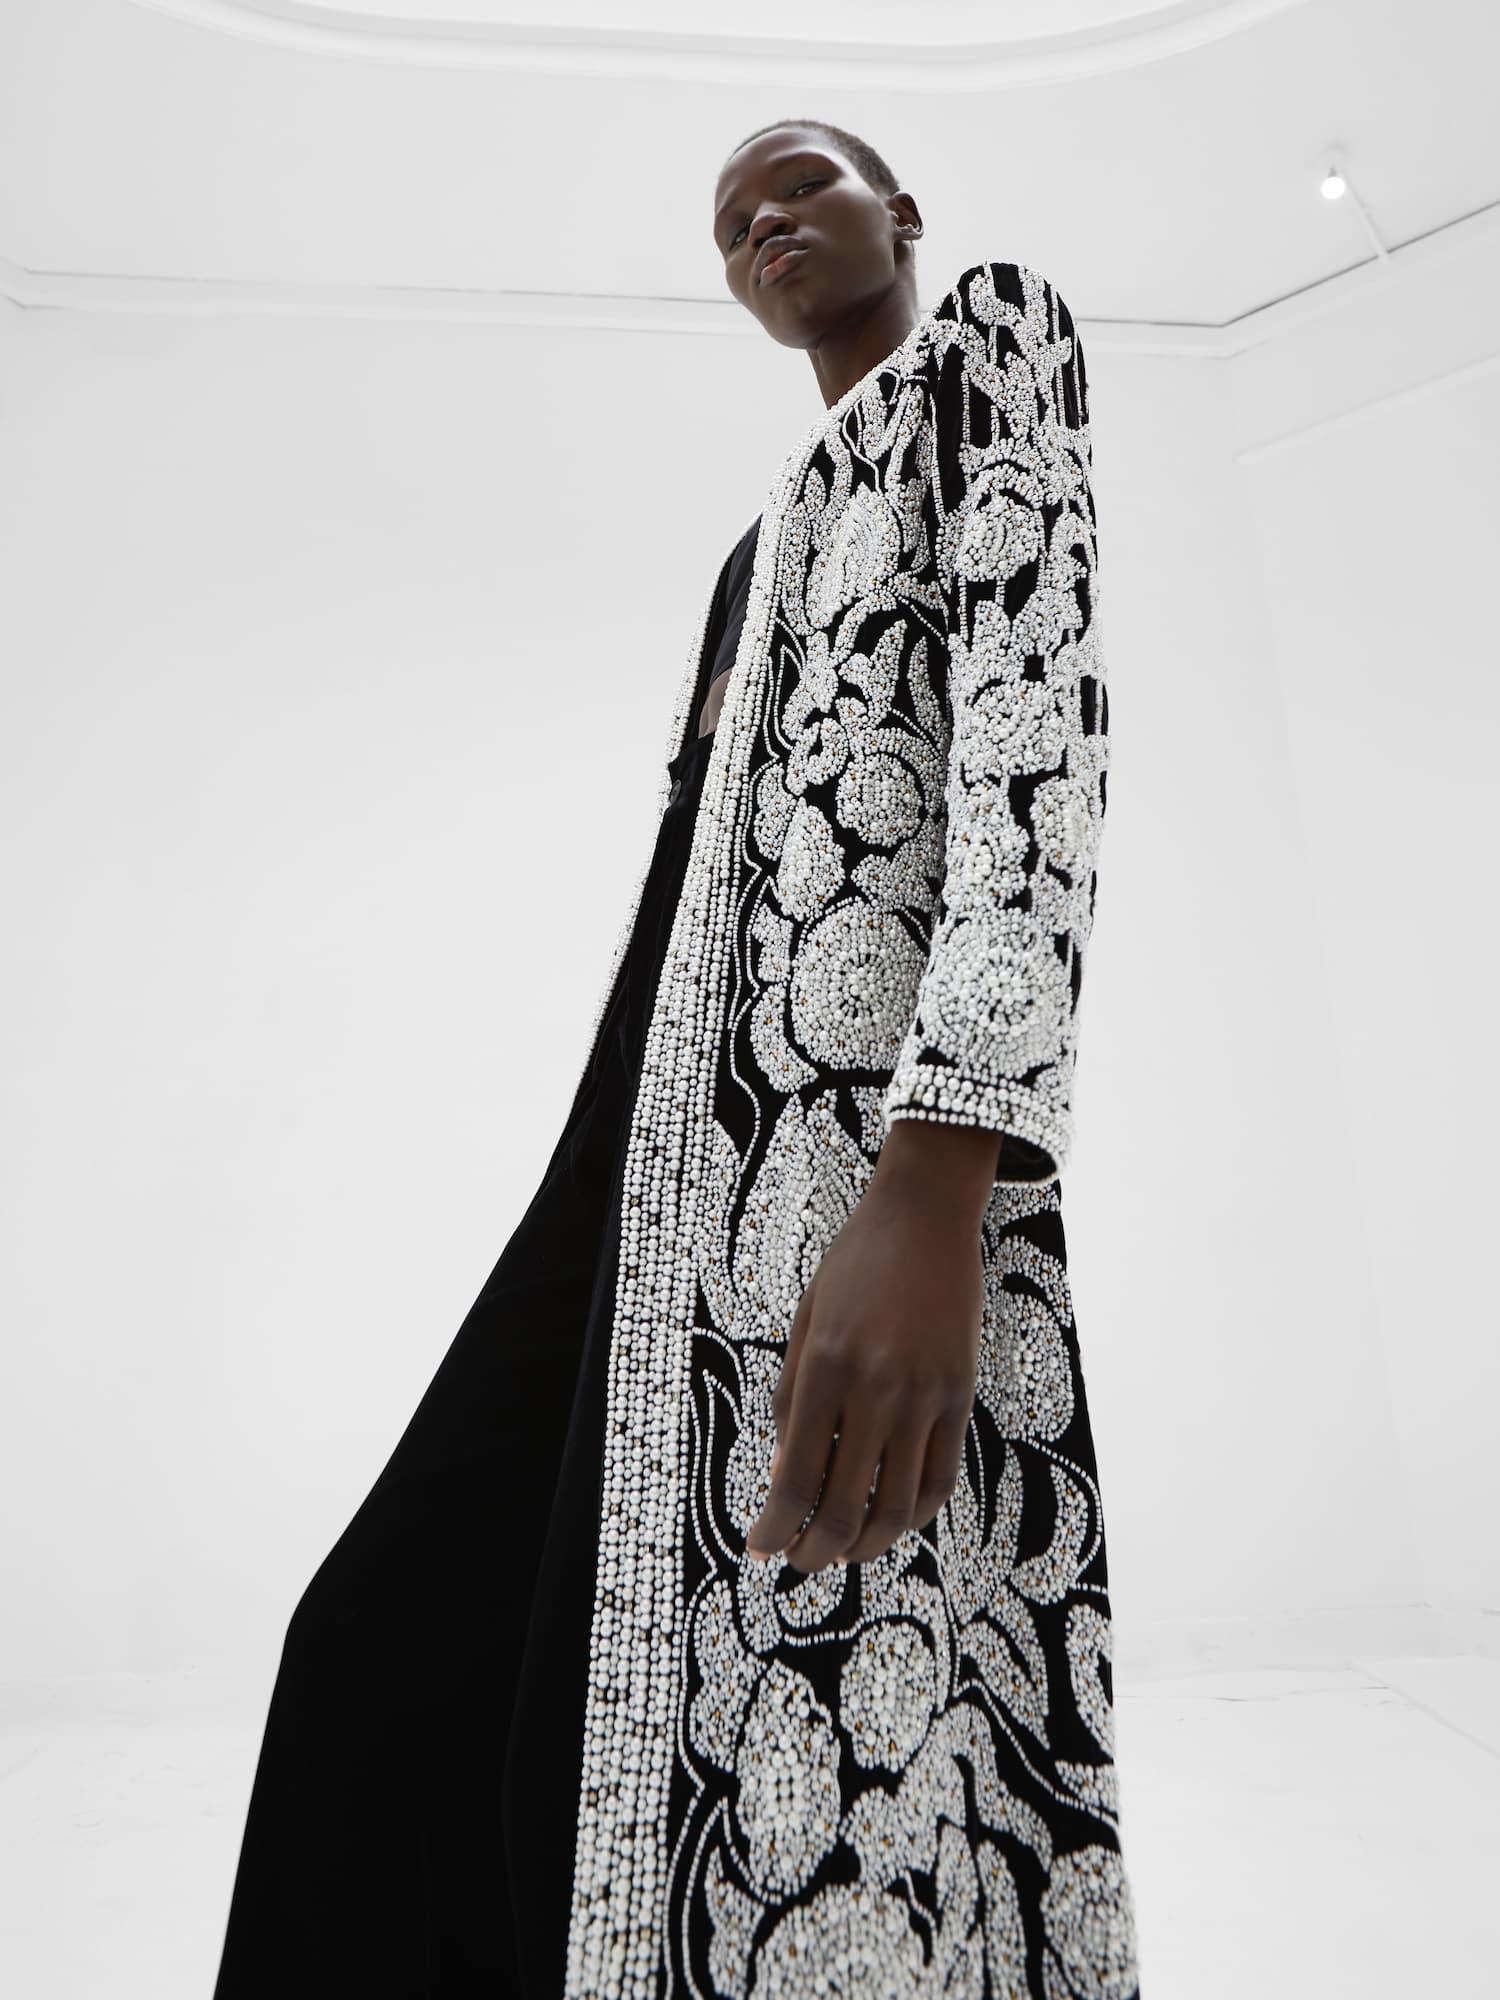 View 3 of model wearing Khaira Kimono in black.